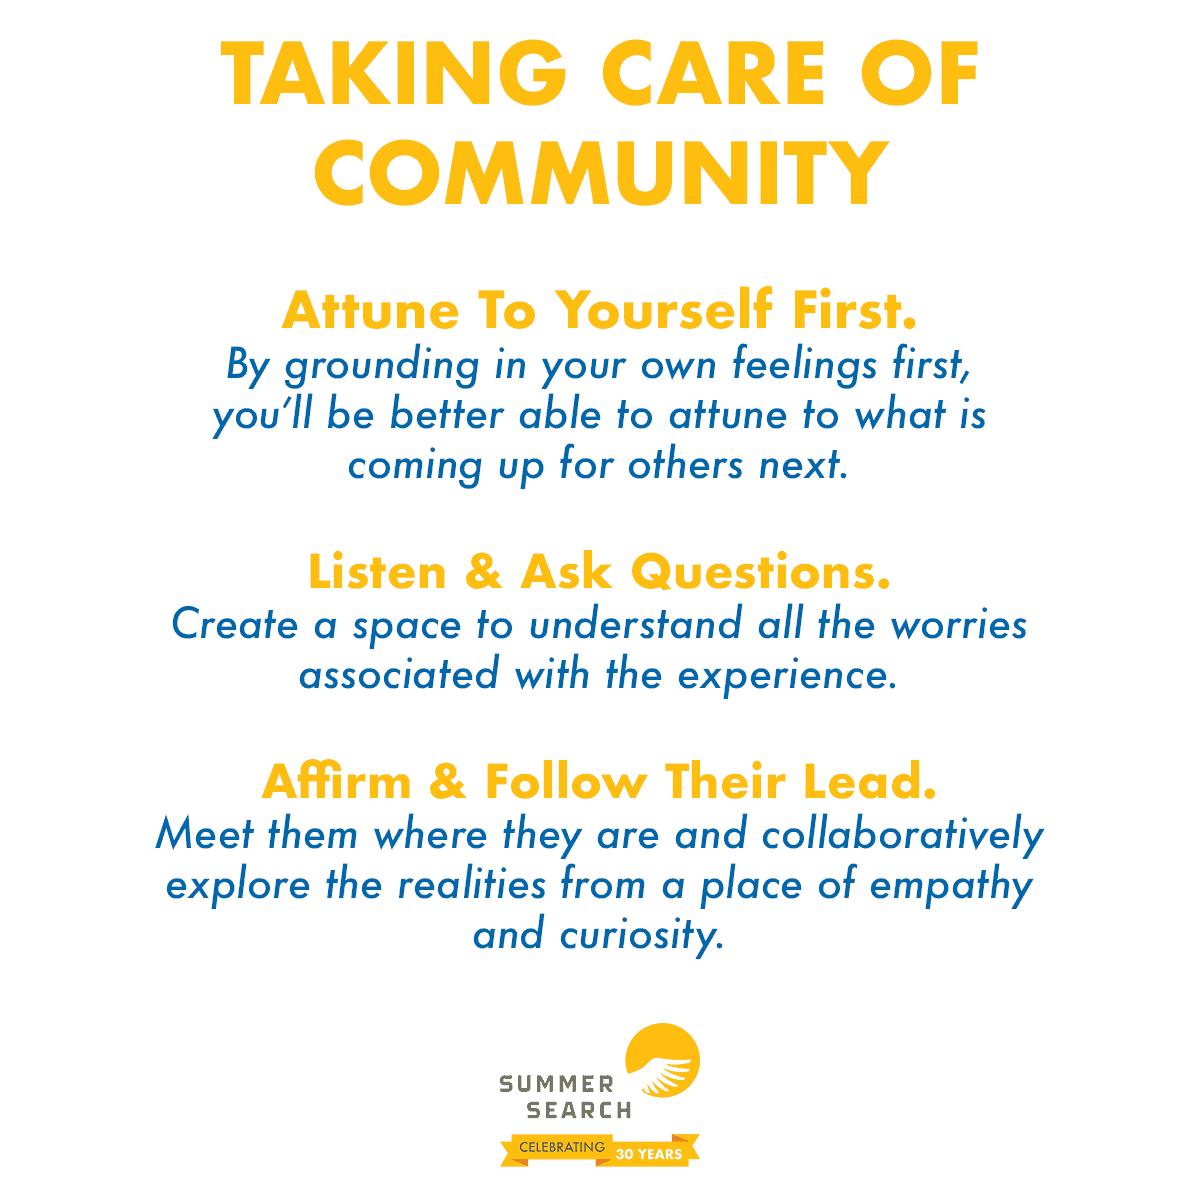 Taking Care of Community Checklist